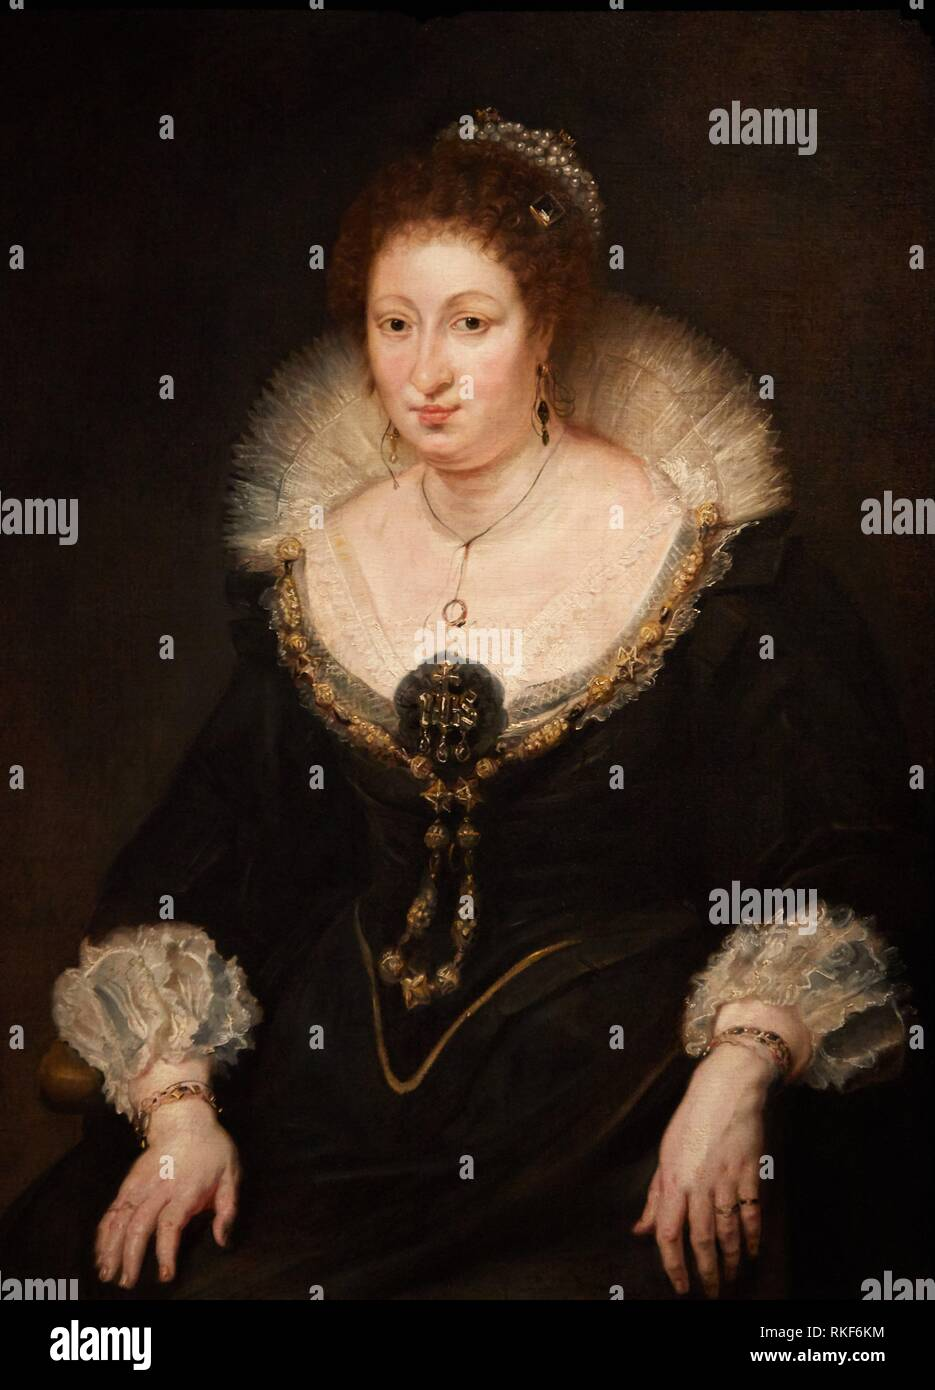 '''Lady Alethea Talbot, Gräfin von Arundel'', 1620, Peter Paul Rubens, Museum für Katalanische Kunst Museu Nacional d Art de Catalunya, MNAC, Stockbild